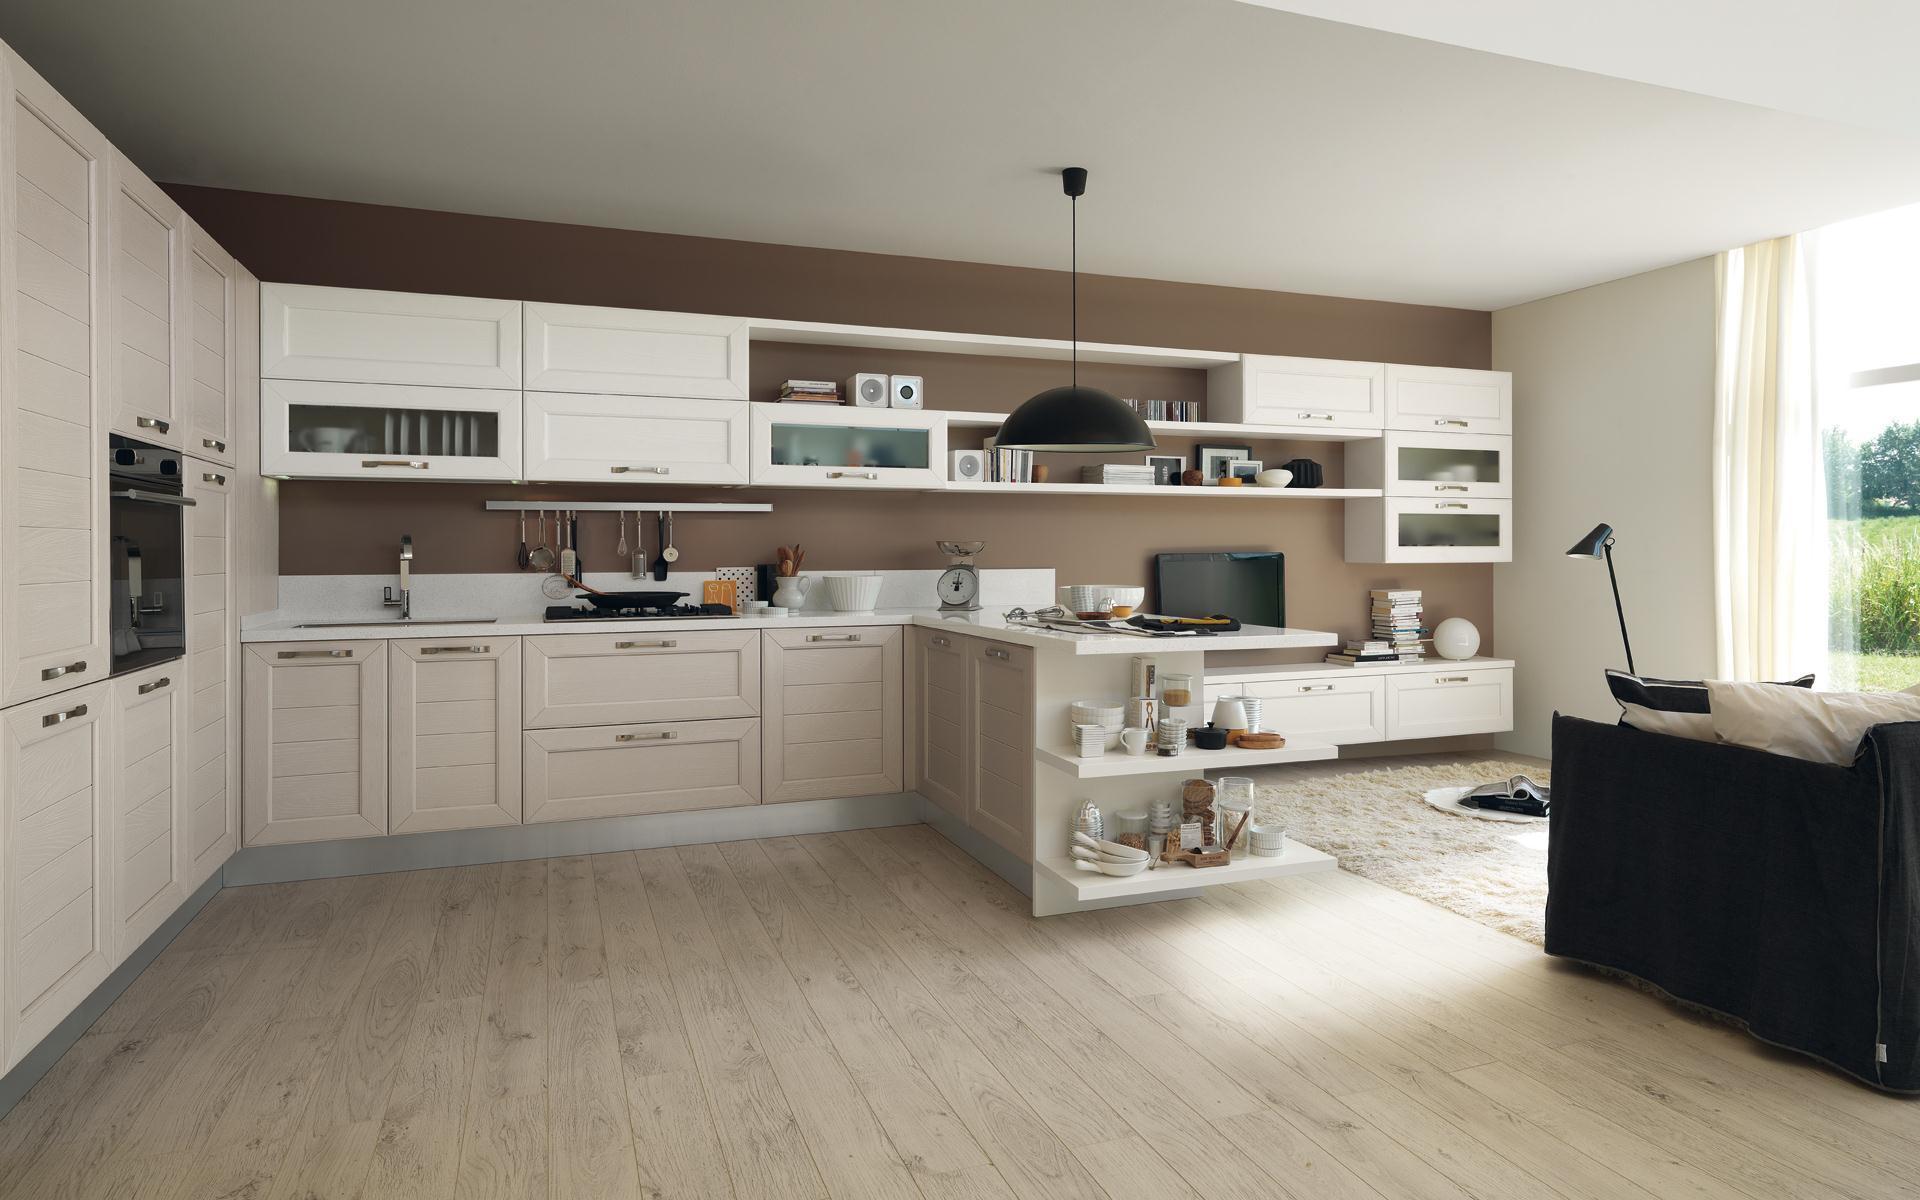 Nuove Cucine Lube - Cucine Lube Opinioni - Ltay.net